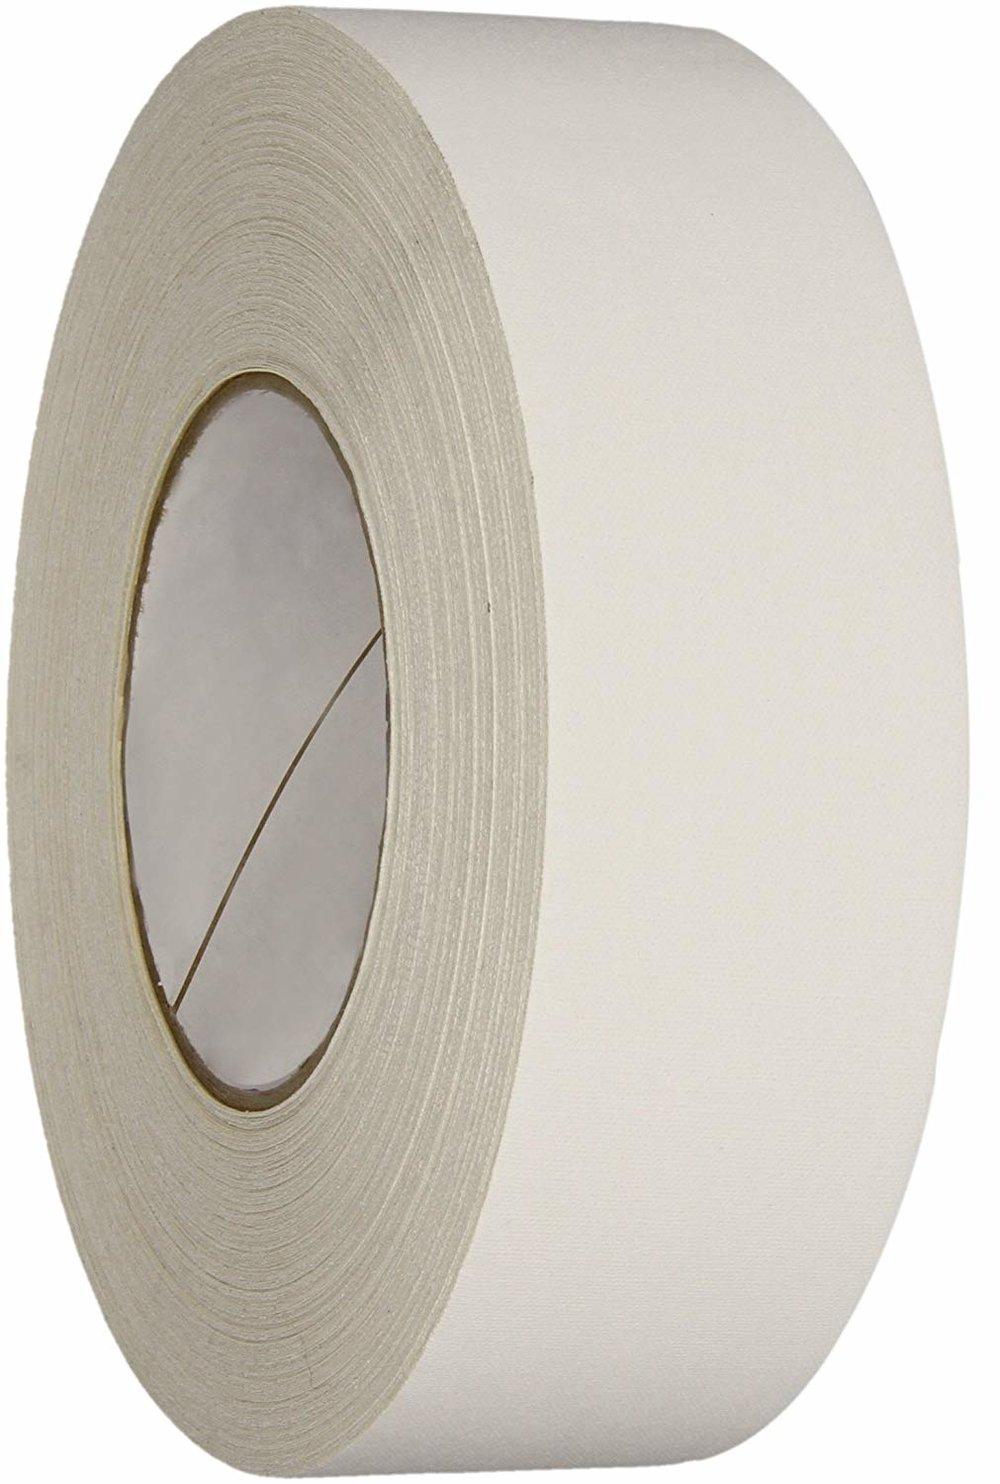 Polyken Vinyl Coated Cloth Premium Gaffer's Tape, 11.5 mil Thick, 50m Length, 48mm Width, White